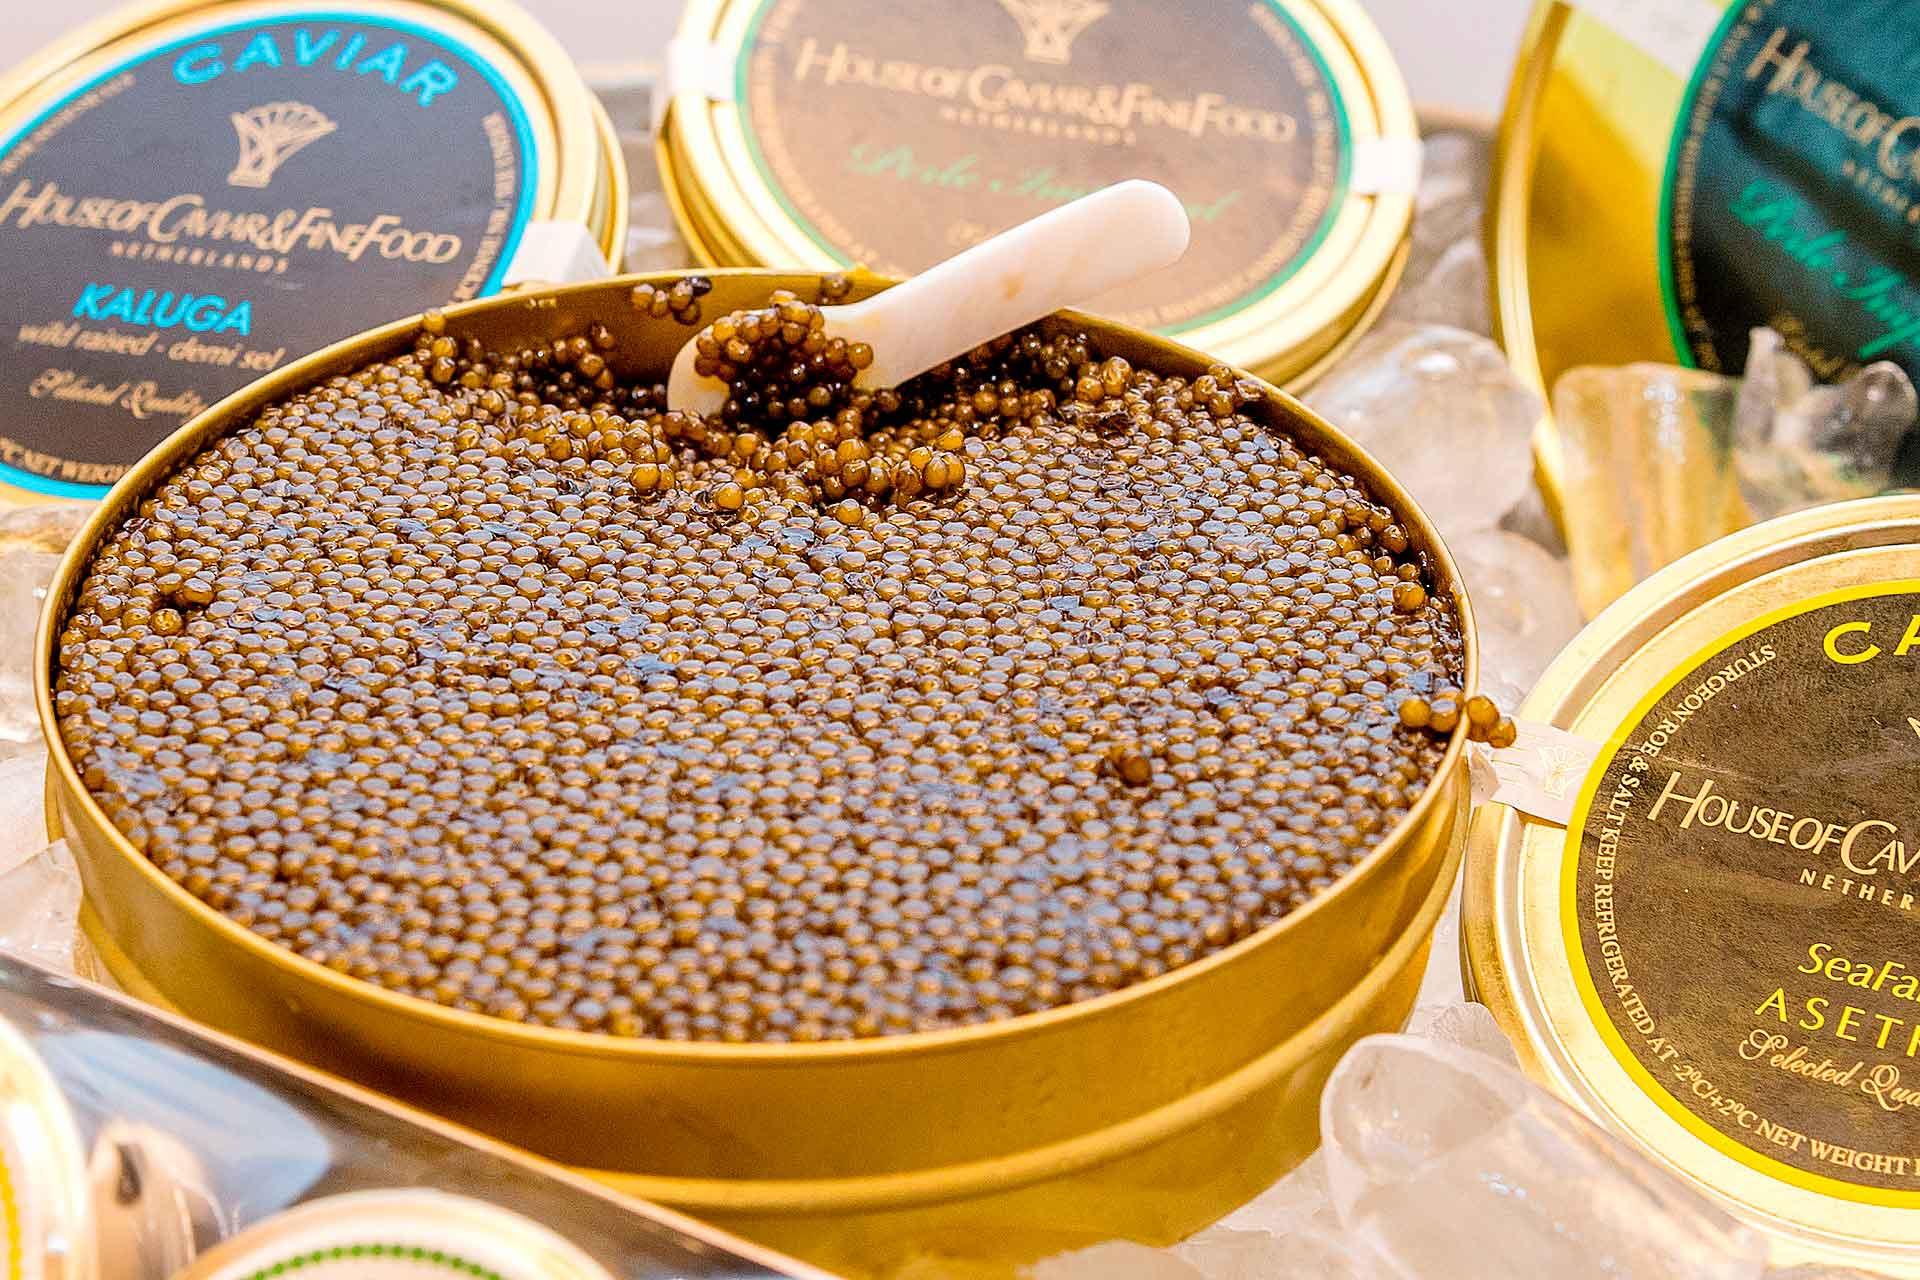 Caviar fine